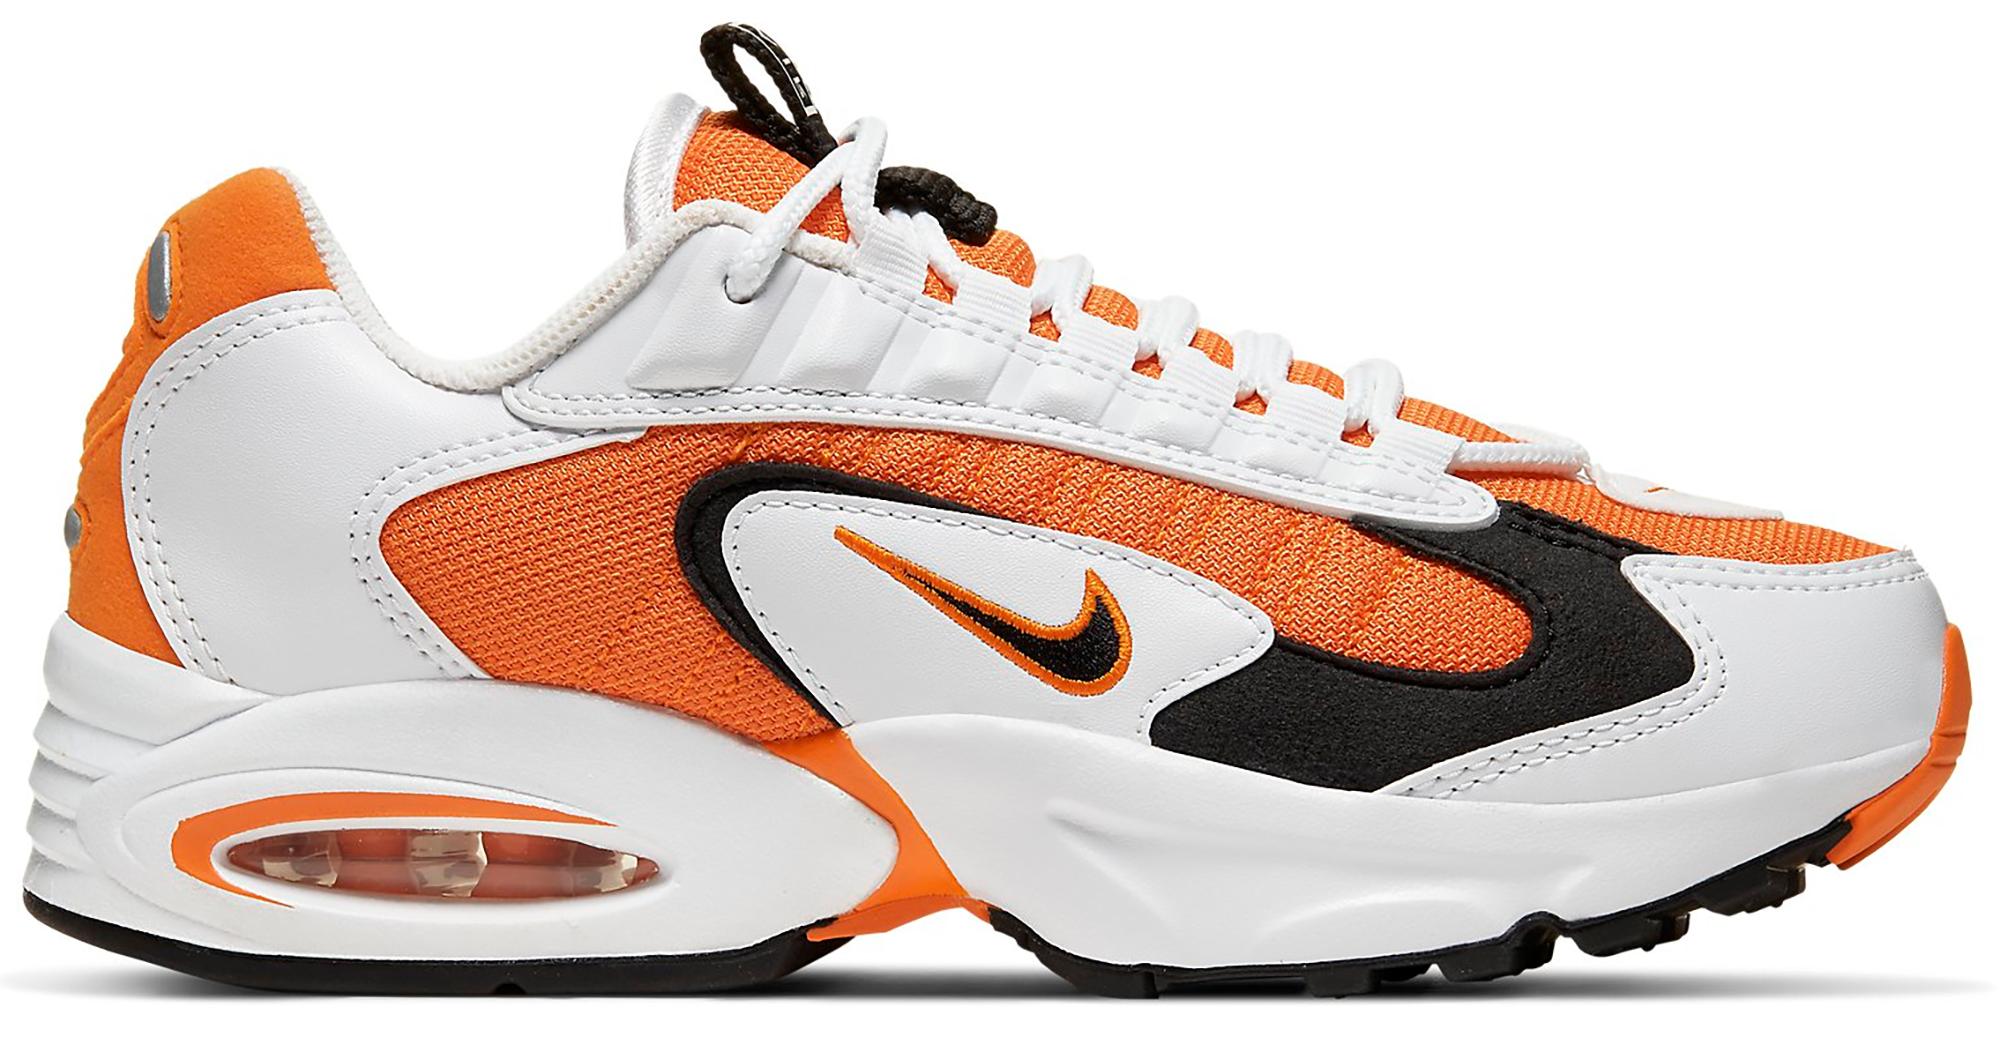 Nike Air Max Triax 96 Magma Orange